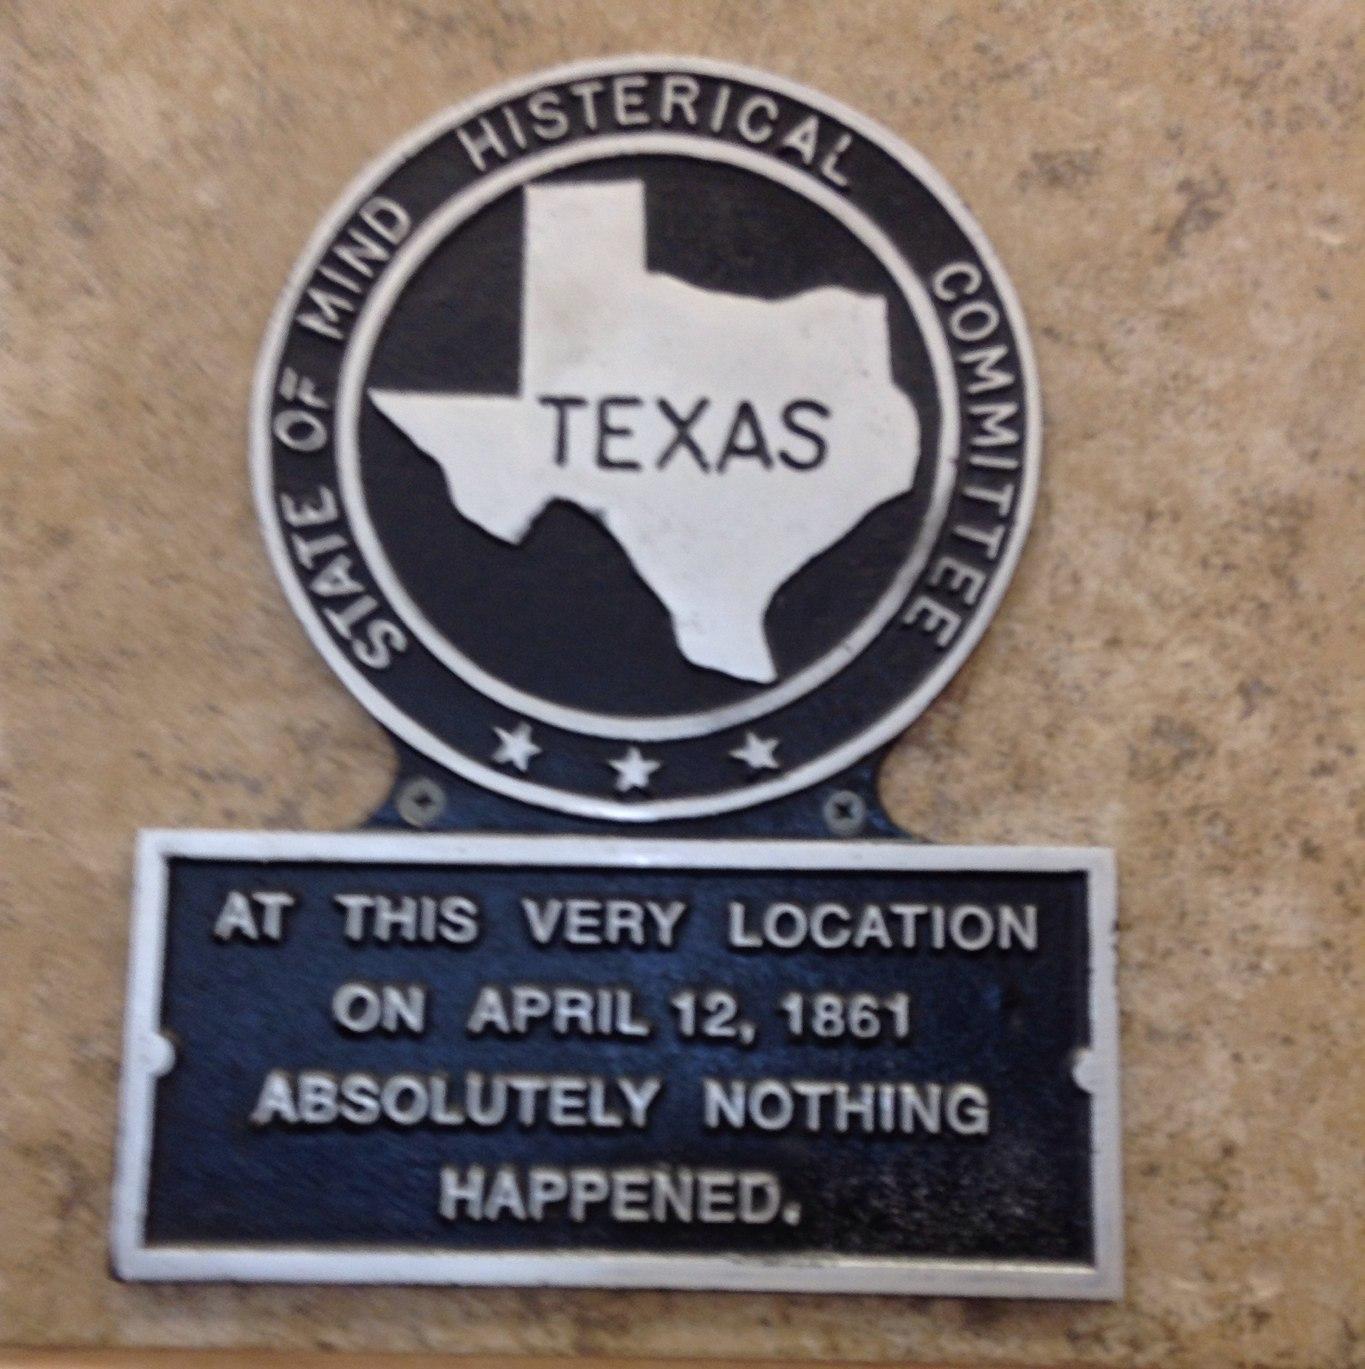 Texas y'all - meme